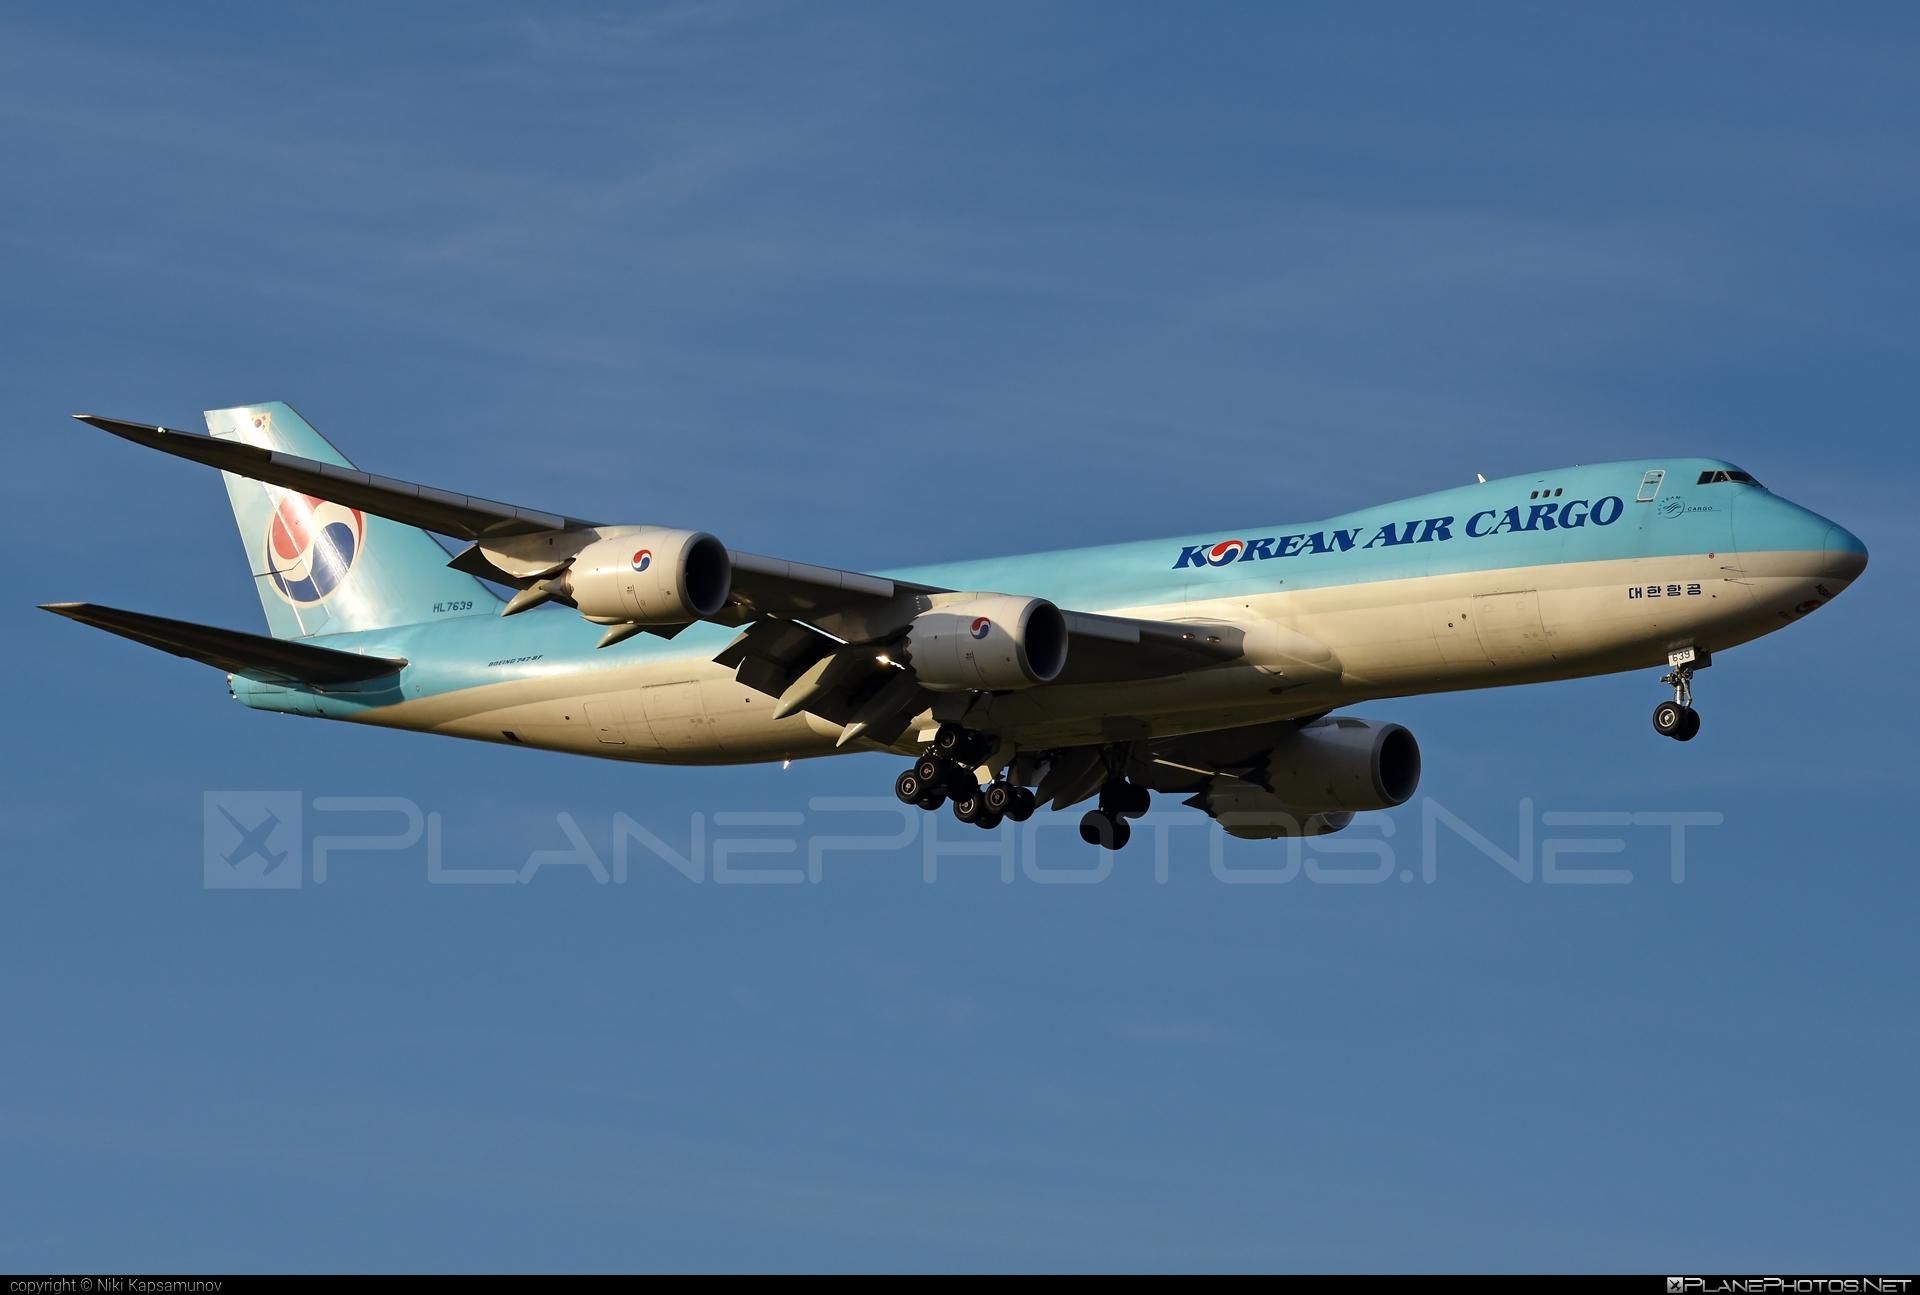 Boeing 747-8F - HL7639 operated by Korean Air Cargo #b747 #b747f #b747freighter #boeing #boeing747 #jumbo #koreanair #koreanaircargo